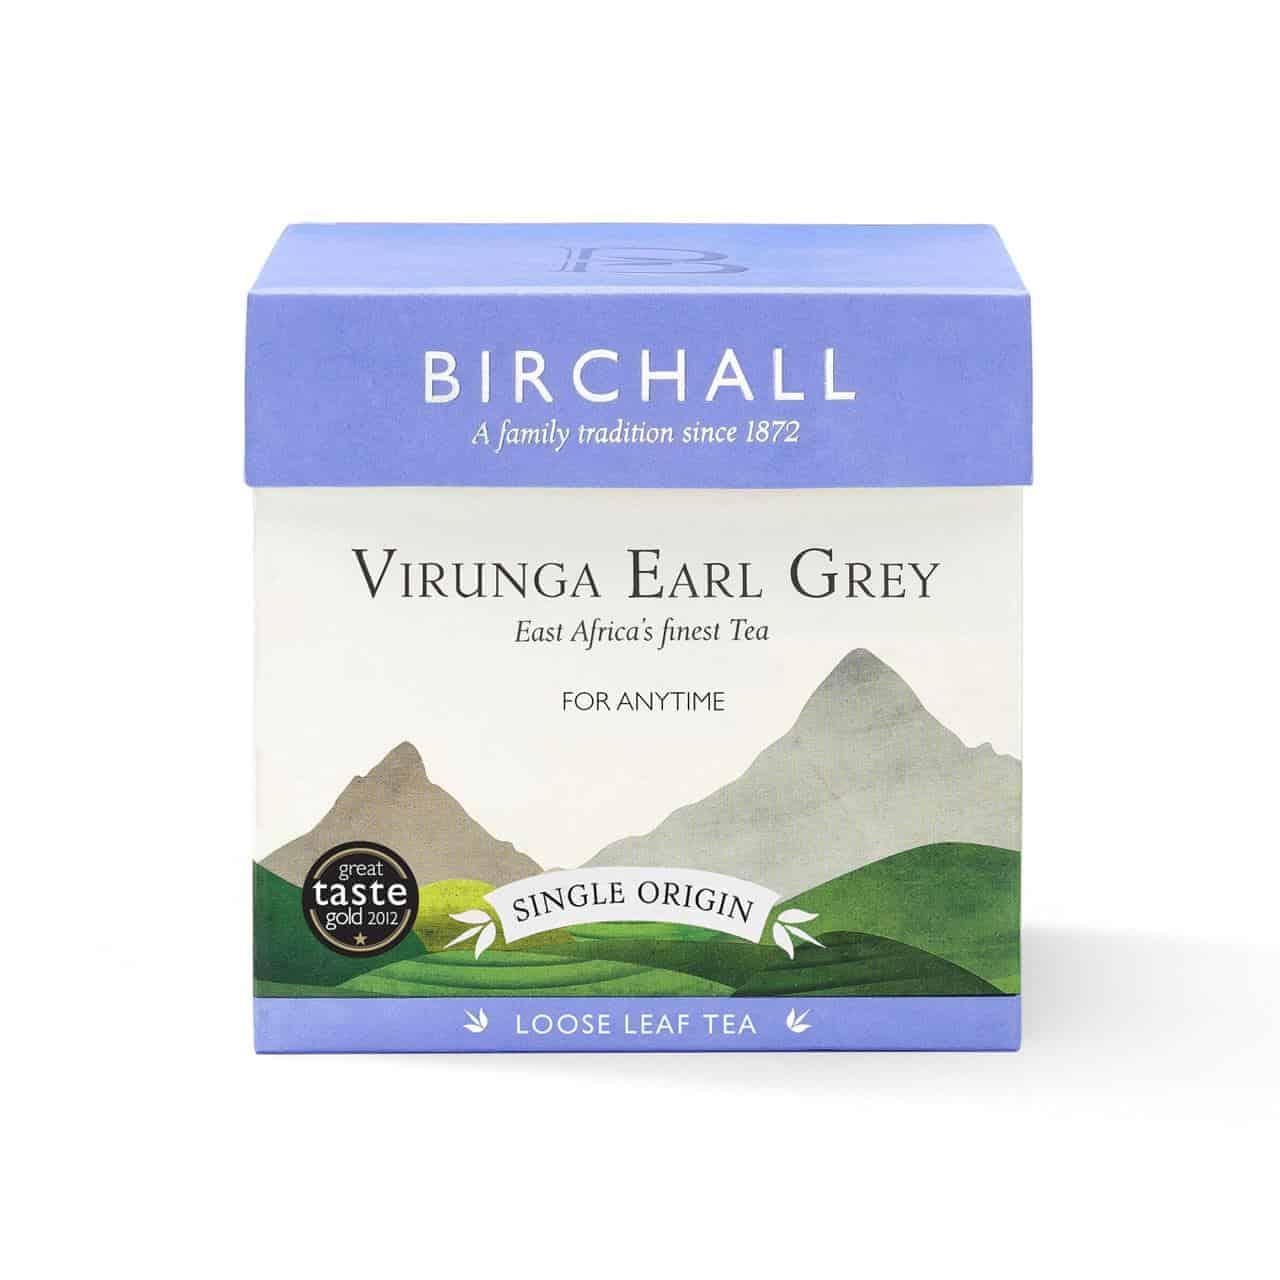 Birchall Virunga Earl Grey - Loose Leaf Tea